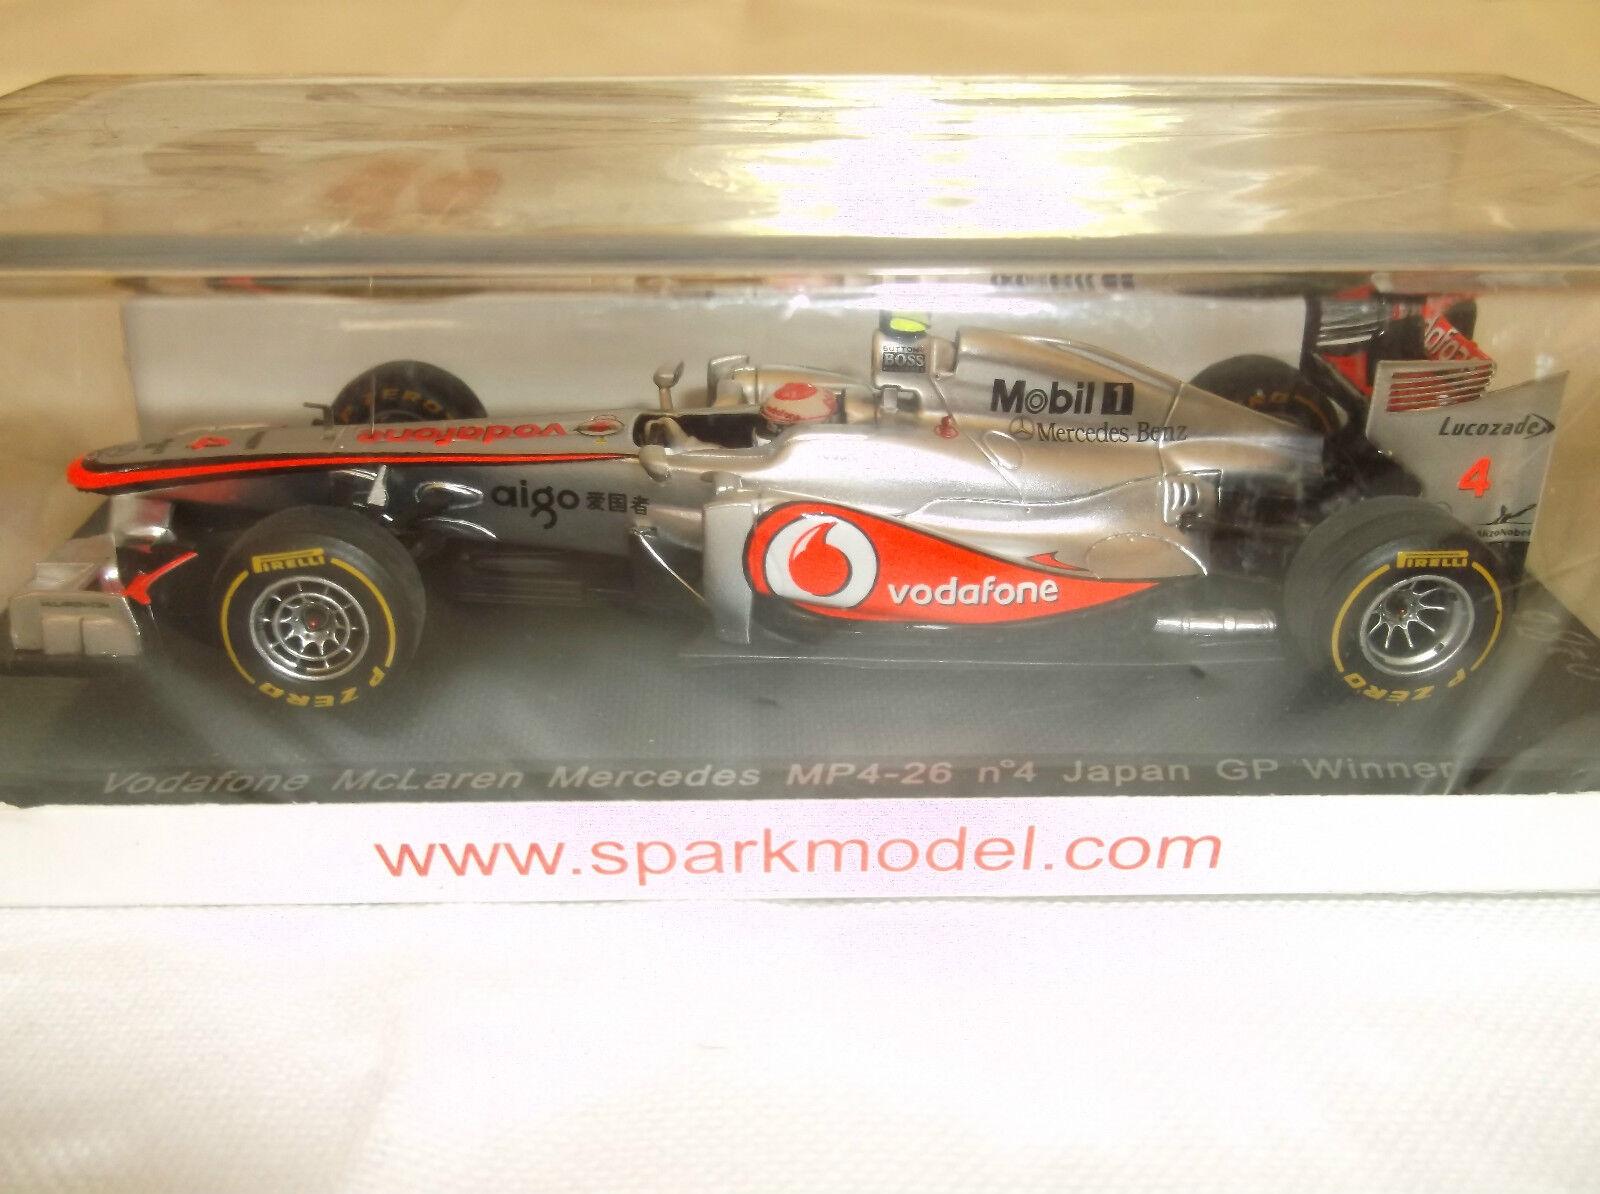 NEW Diecast SPARK F1  1 43 Jenson Button McLaren Mercedes MP4-26  Japan GP